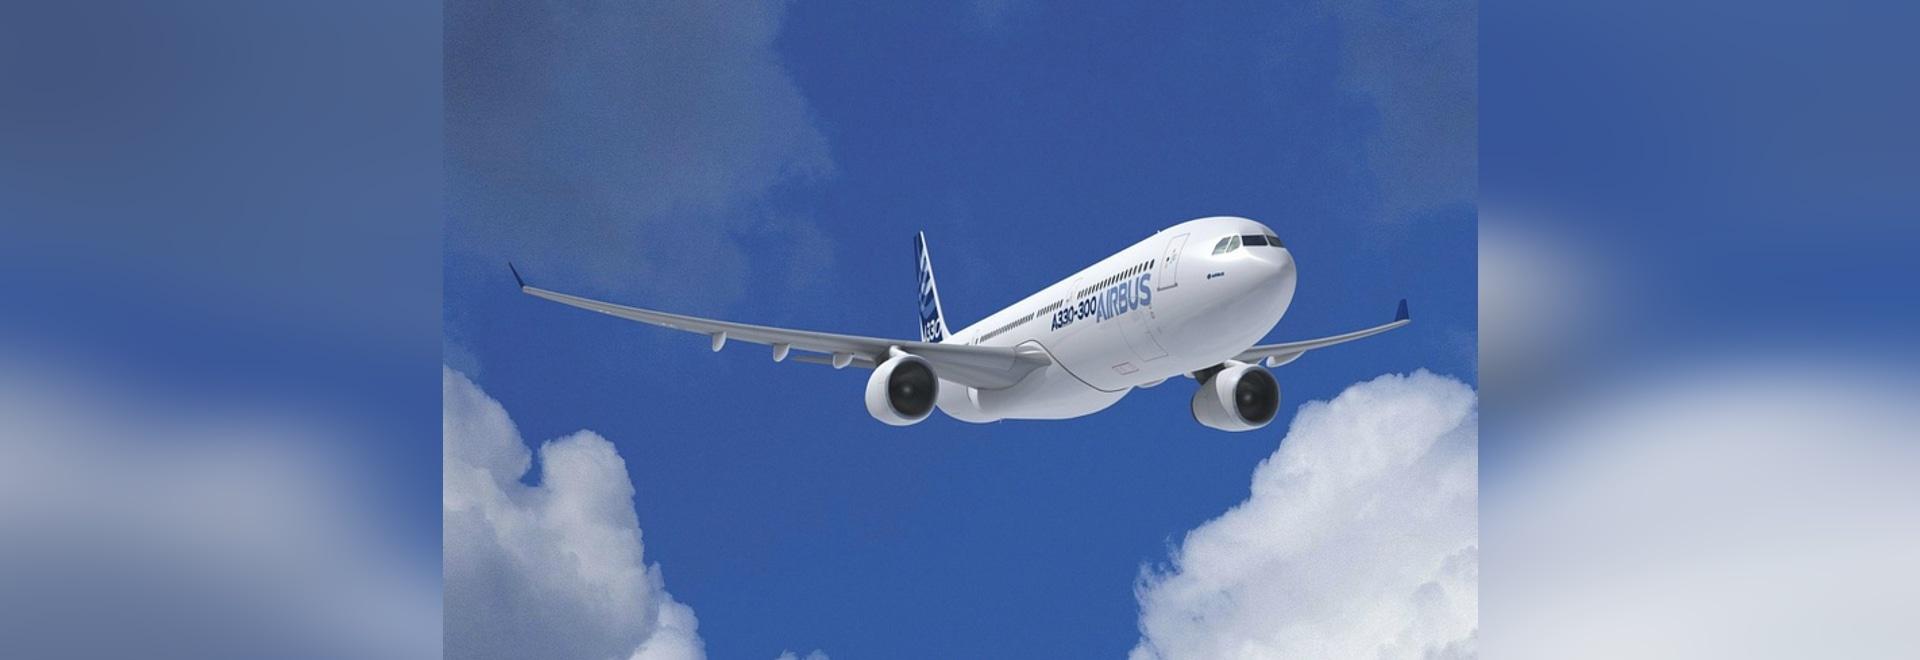 Cortesia di Airbus